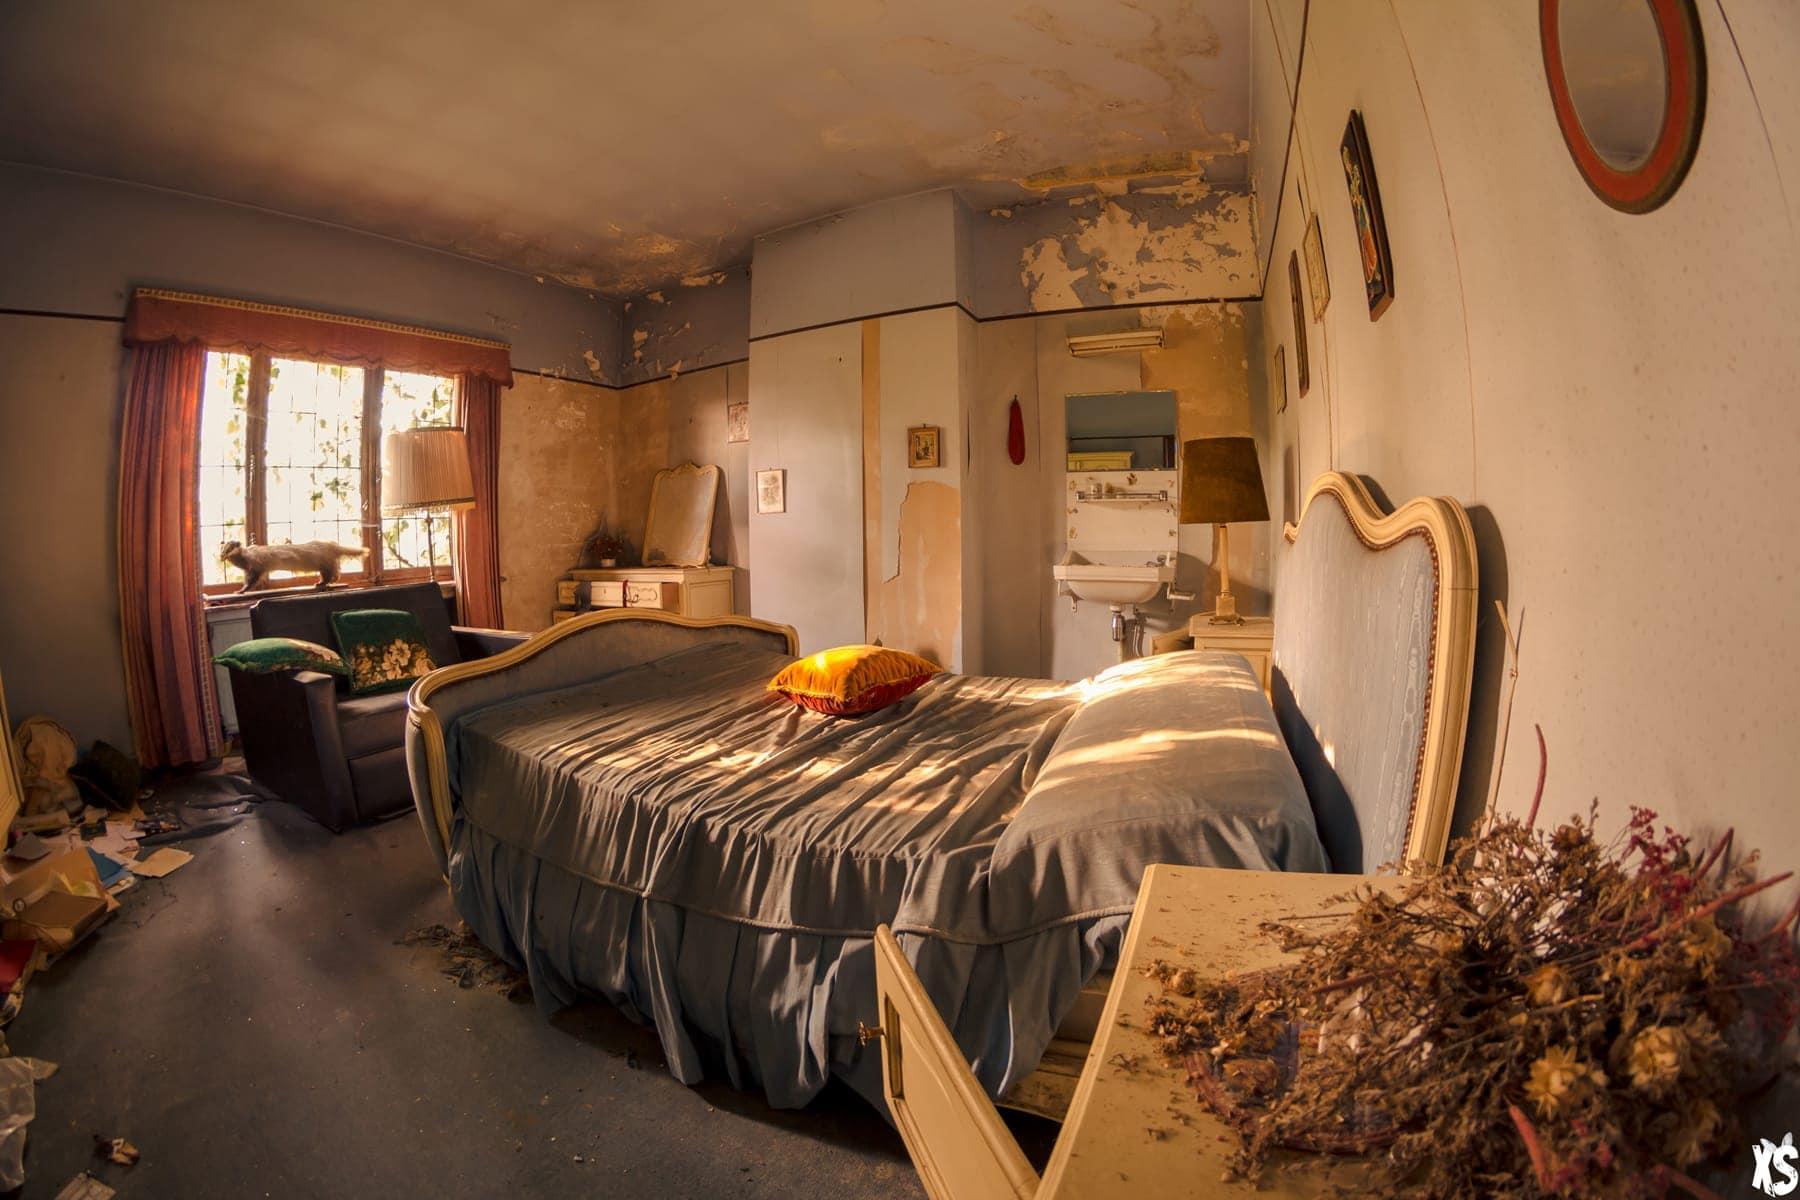 Villa abandonnée située en Italie | urbexsession.com/villa-docteur-buck-ruxton | Urbex Belgique